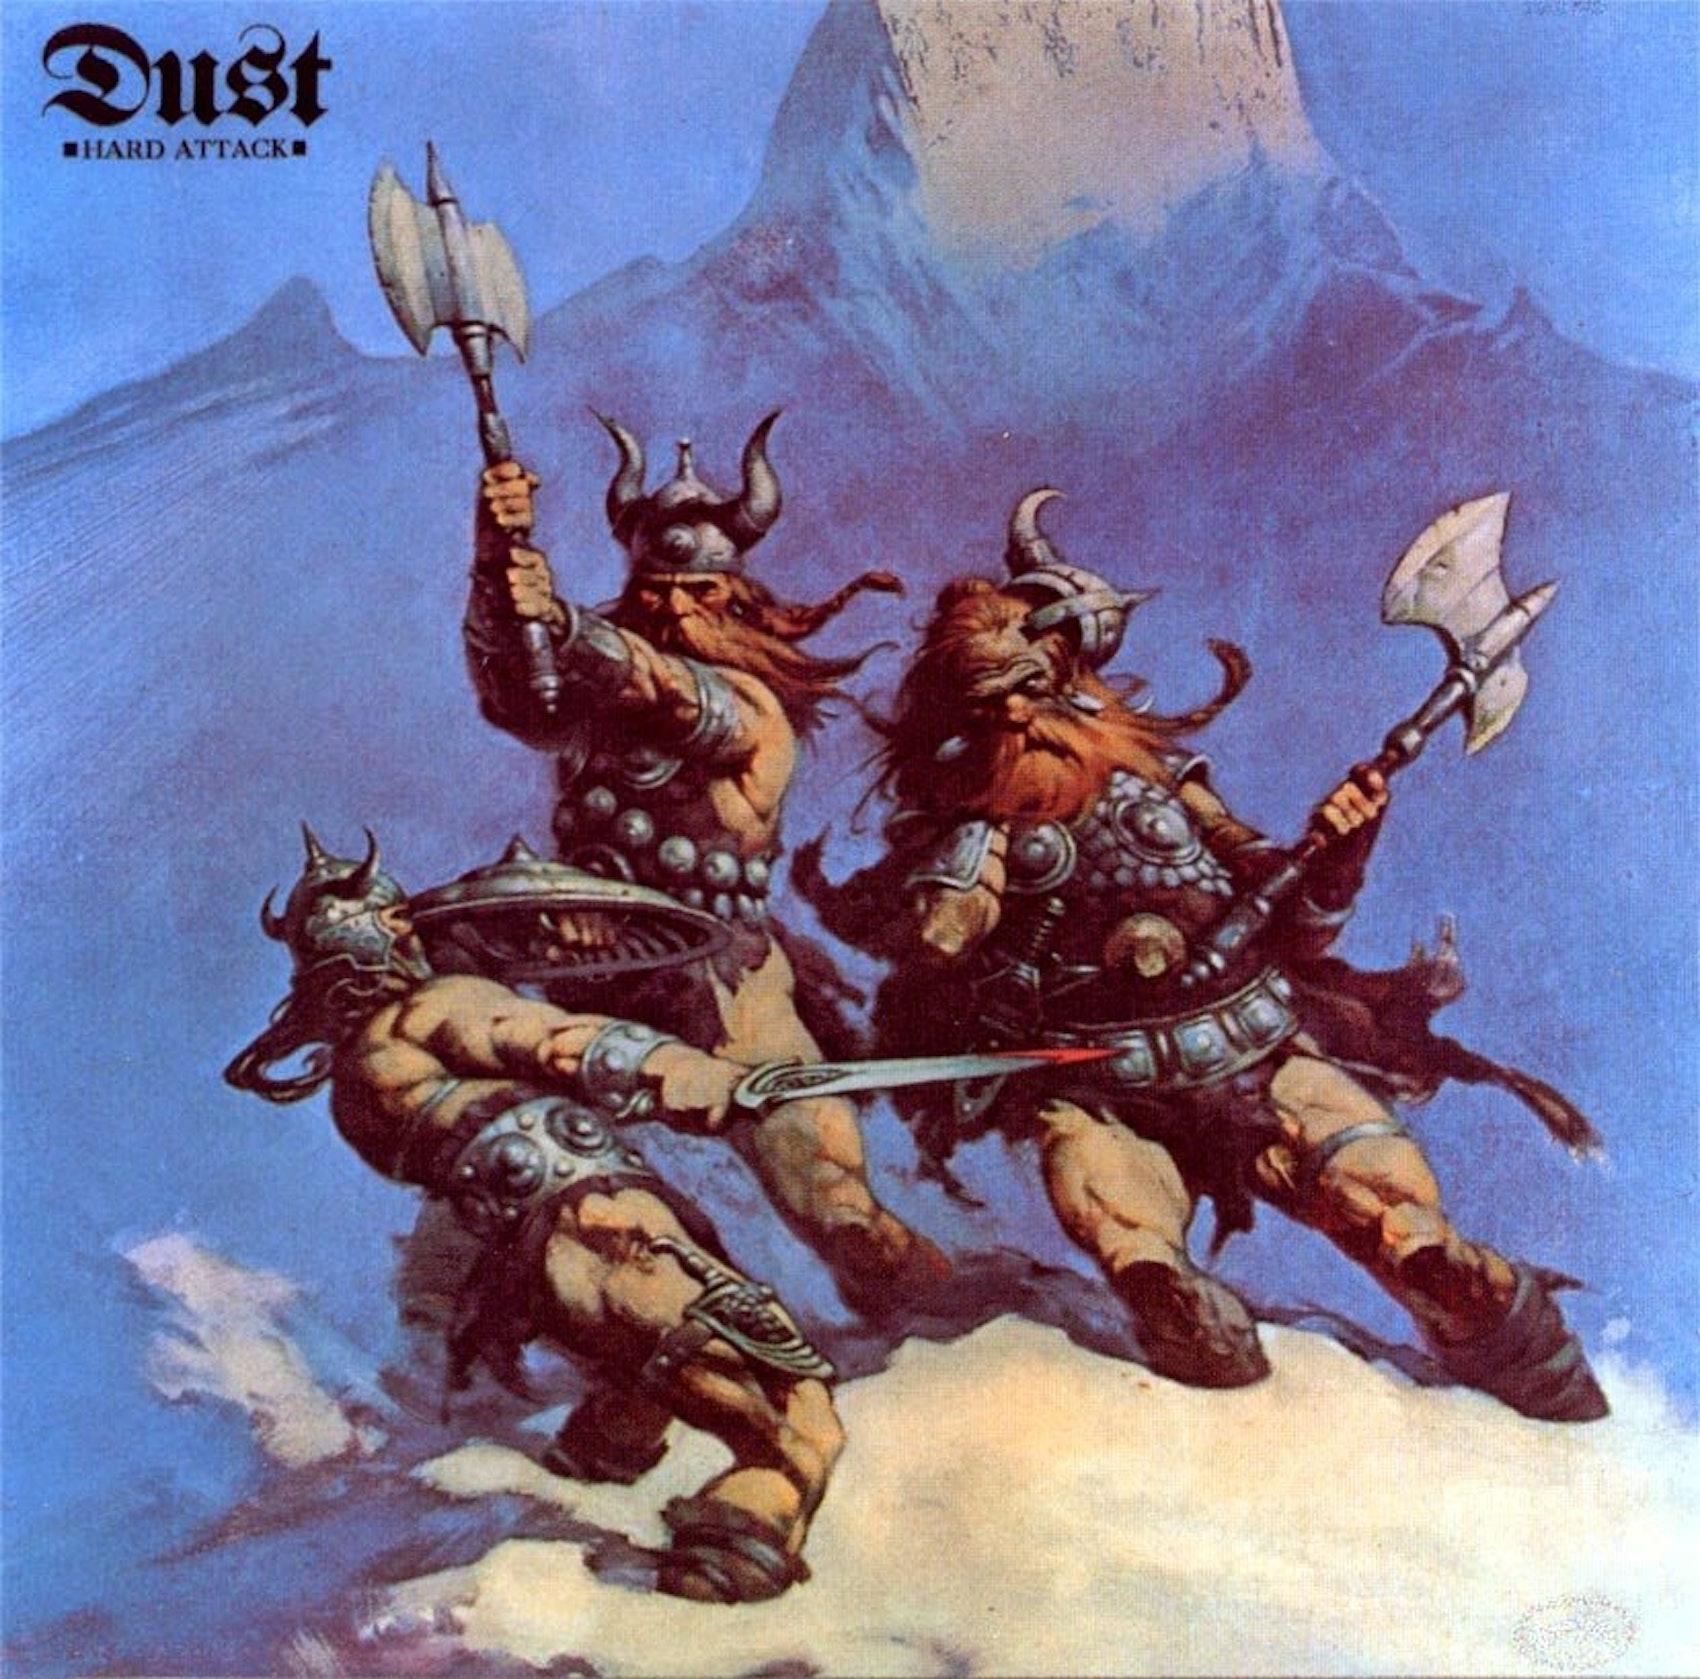 8bd8a38fd66 The 10 Best Proto Metal Albums To Own On Vinyl — Vinyl Me